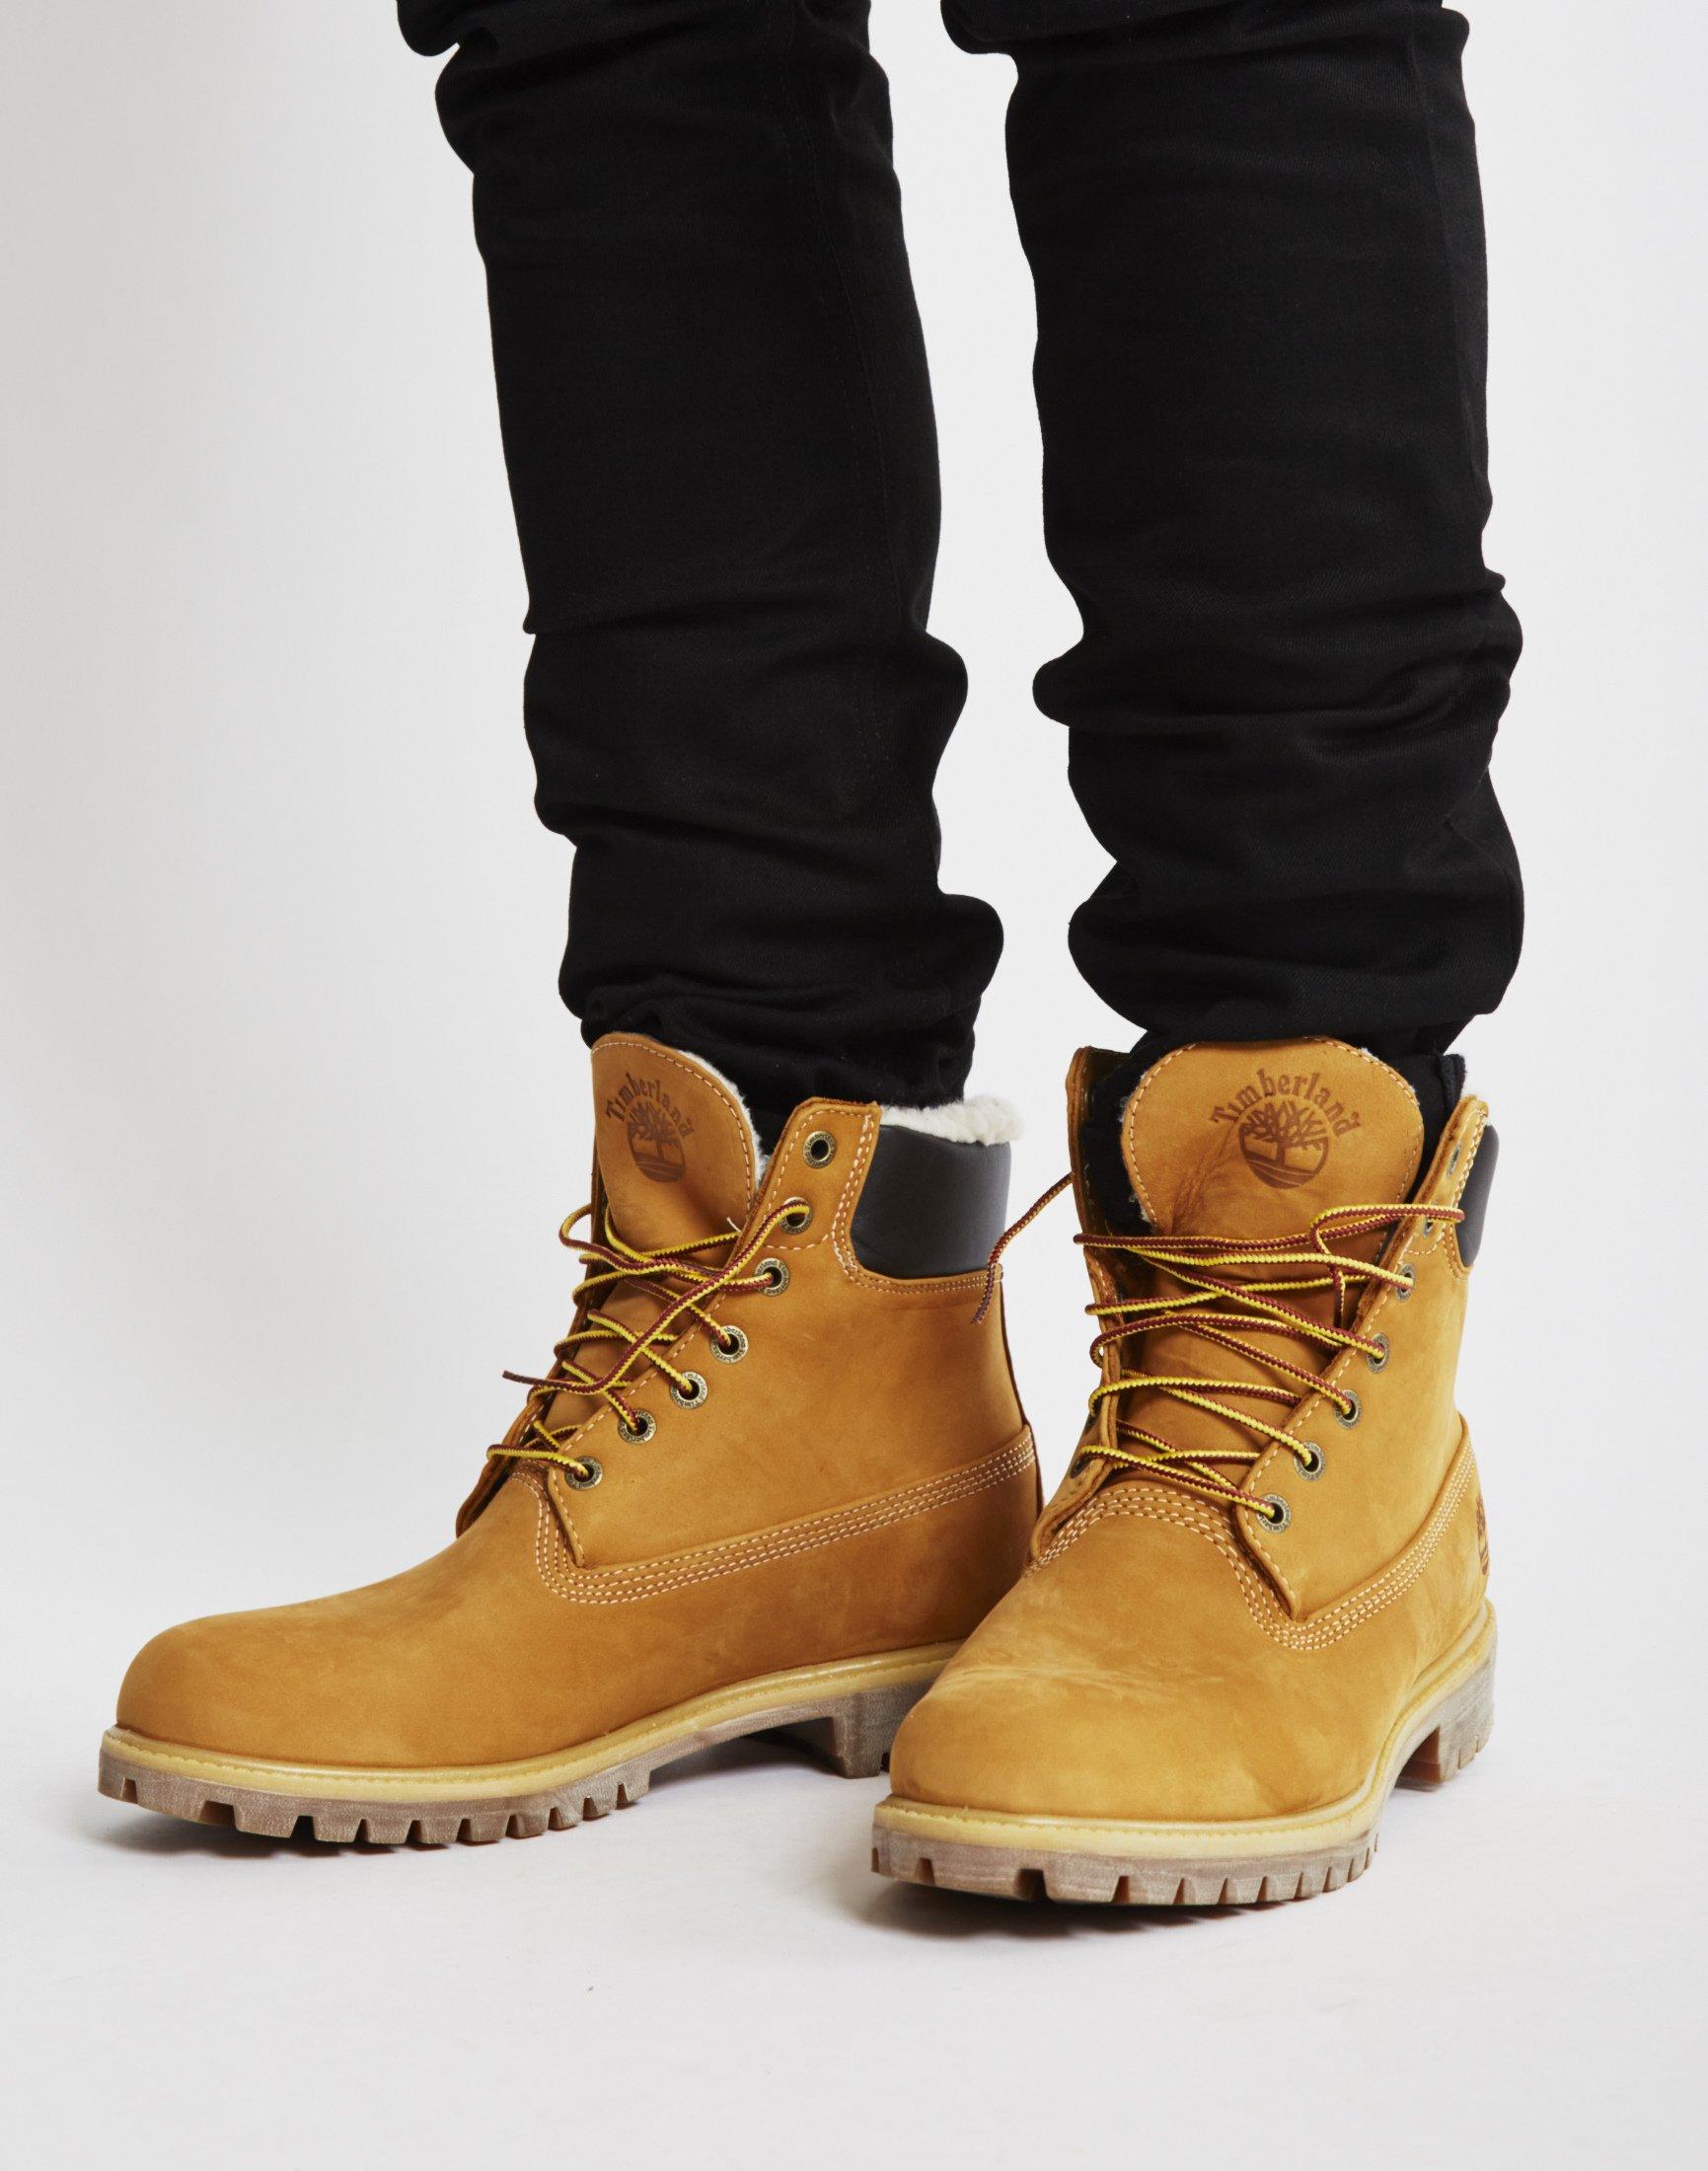 Waterproof winter boots fashion 97